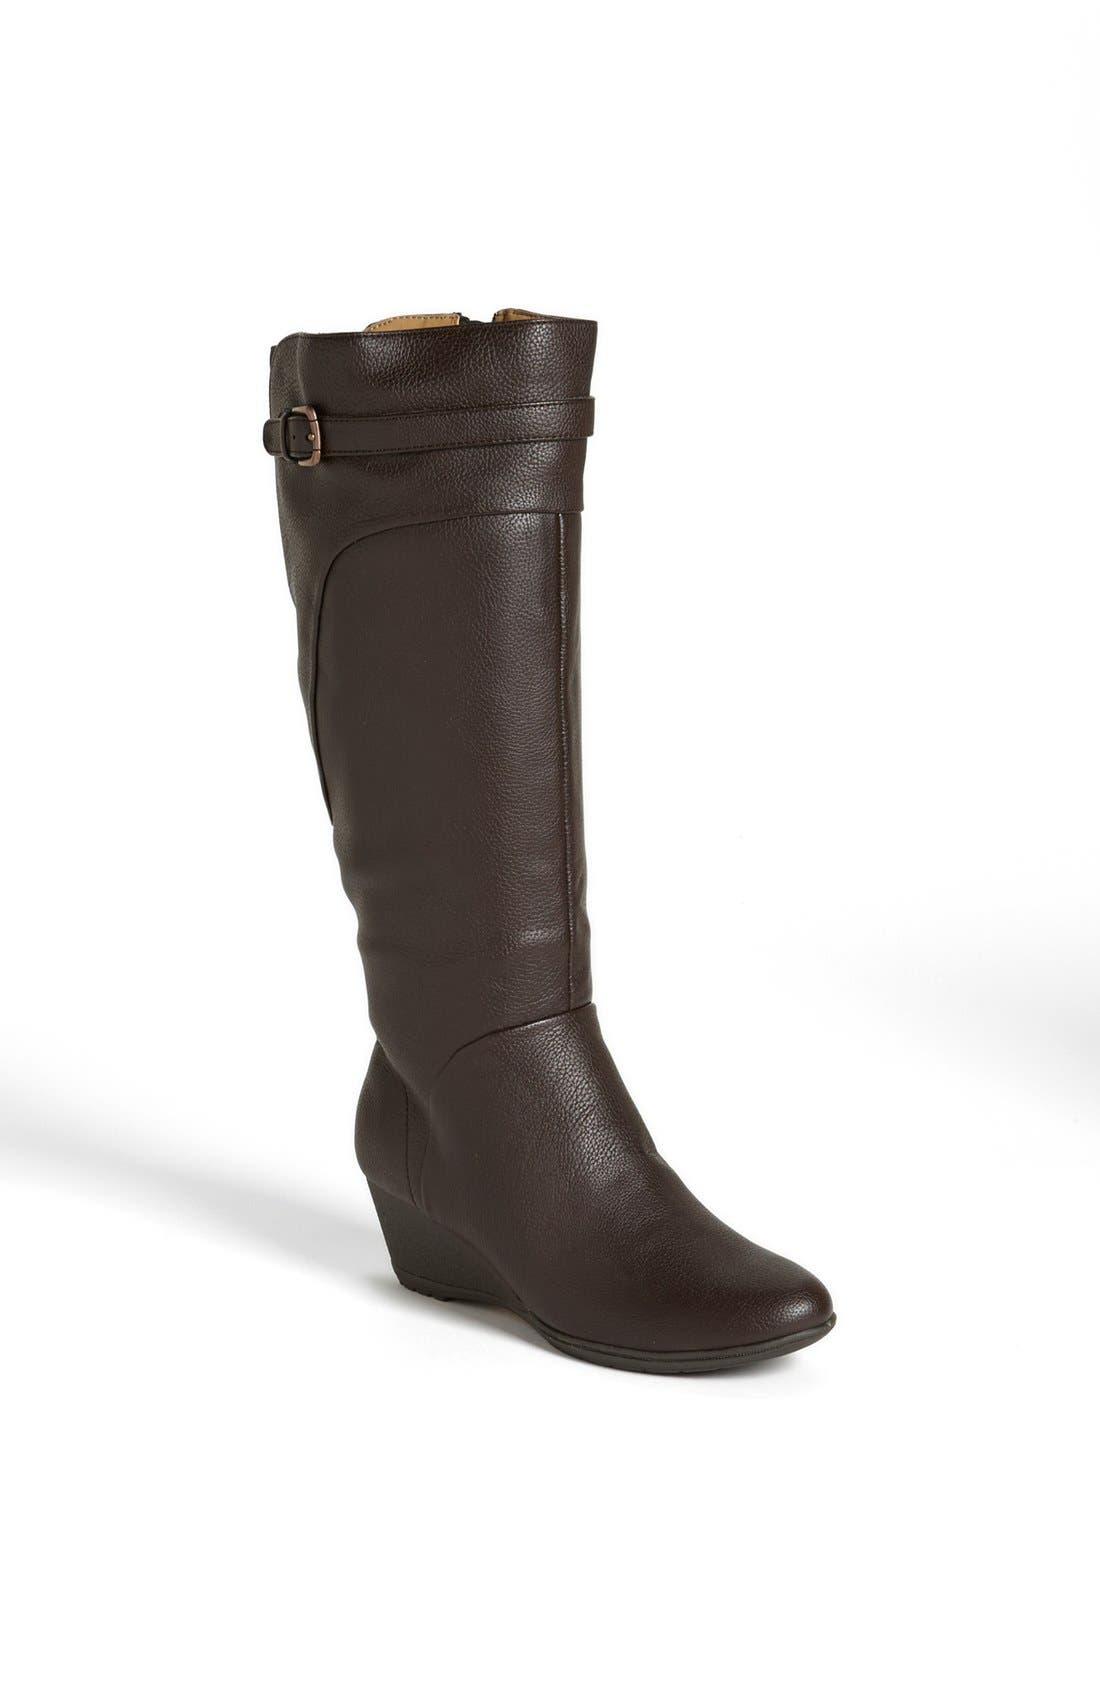 Main Image - Softspots 'Oliva' Boot